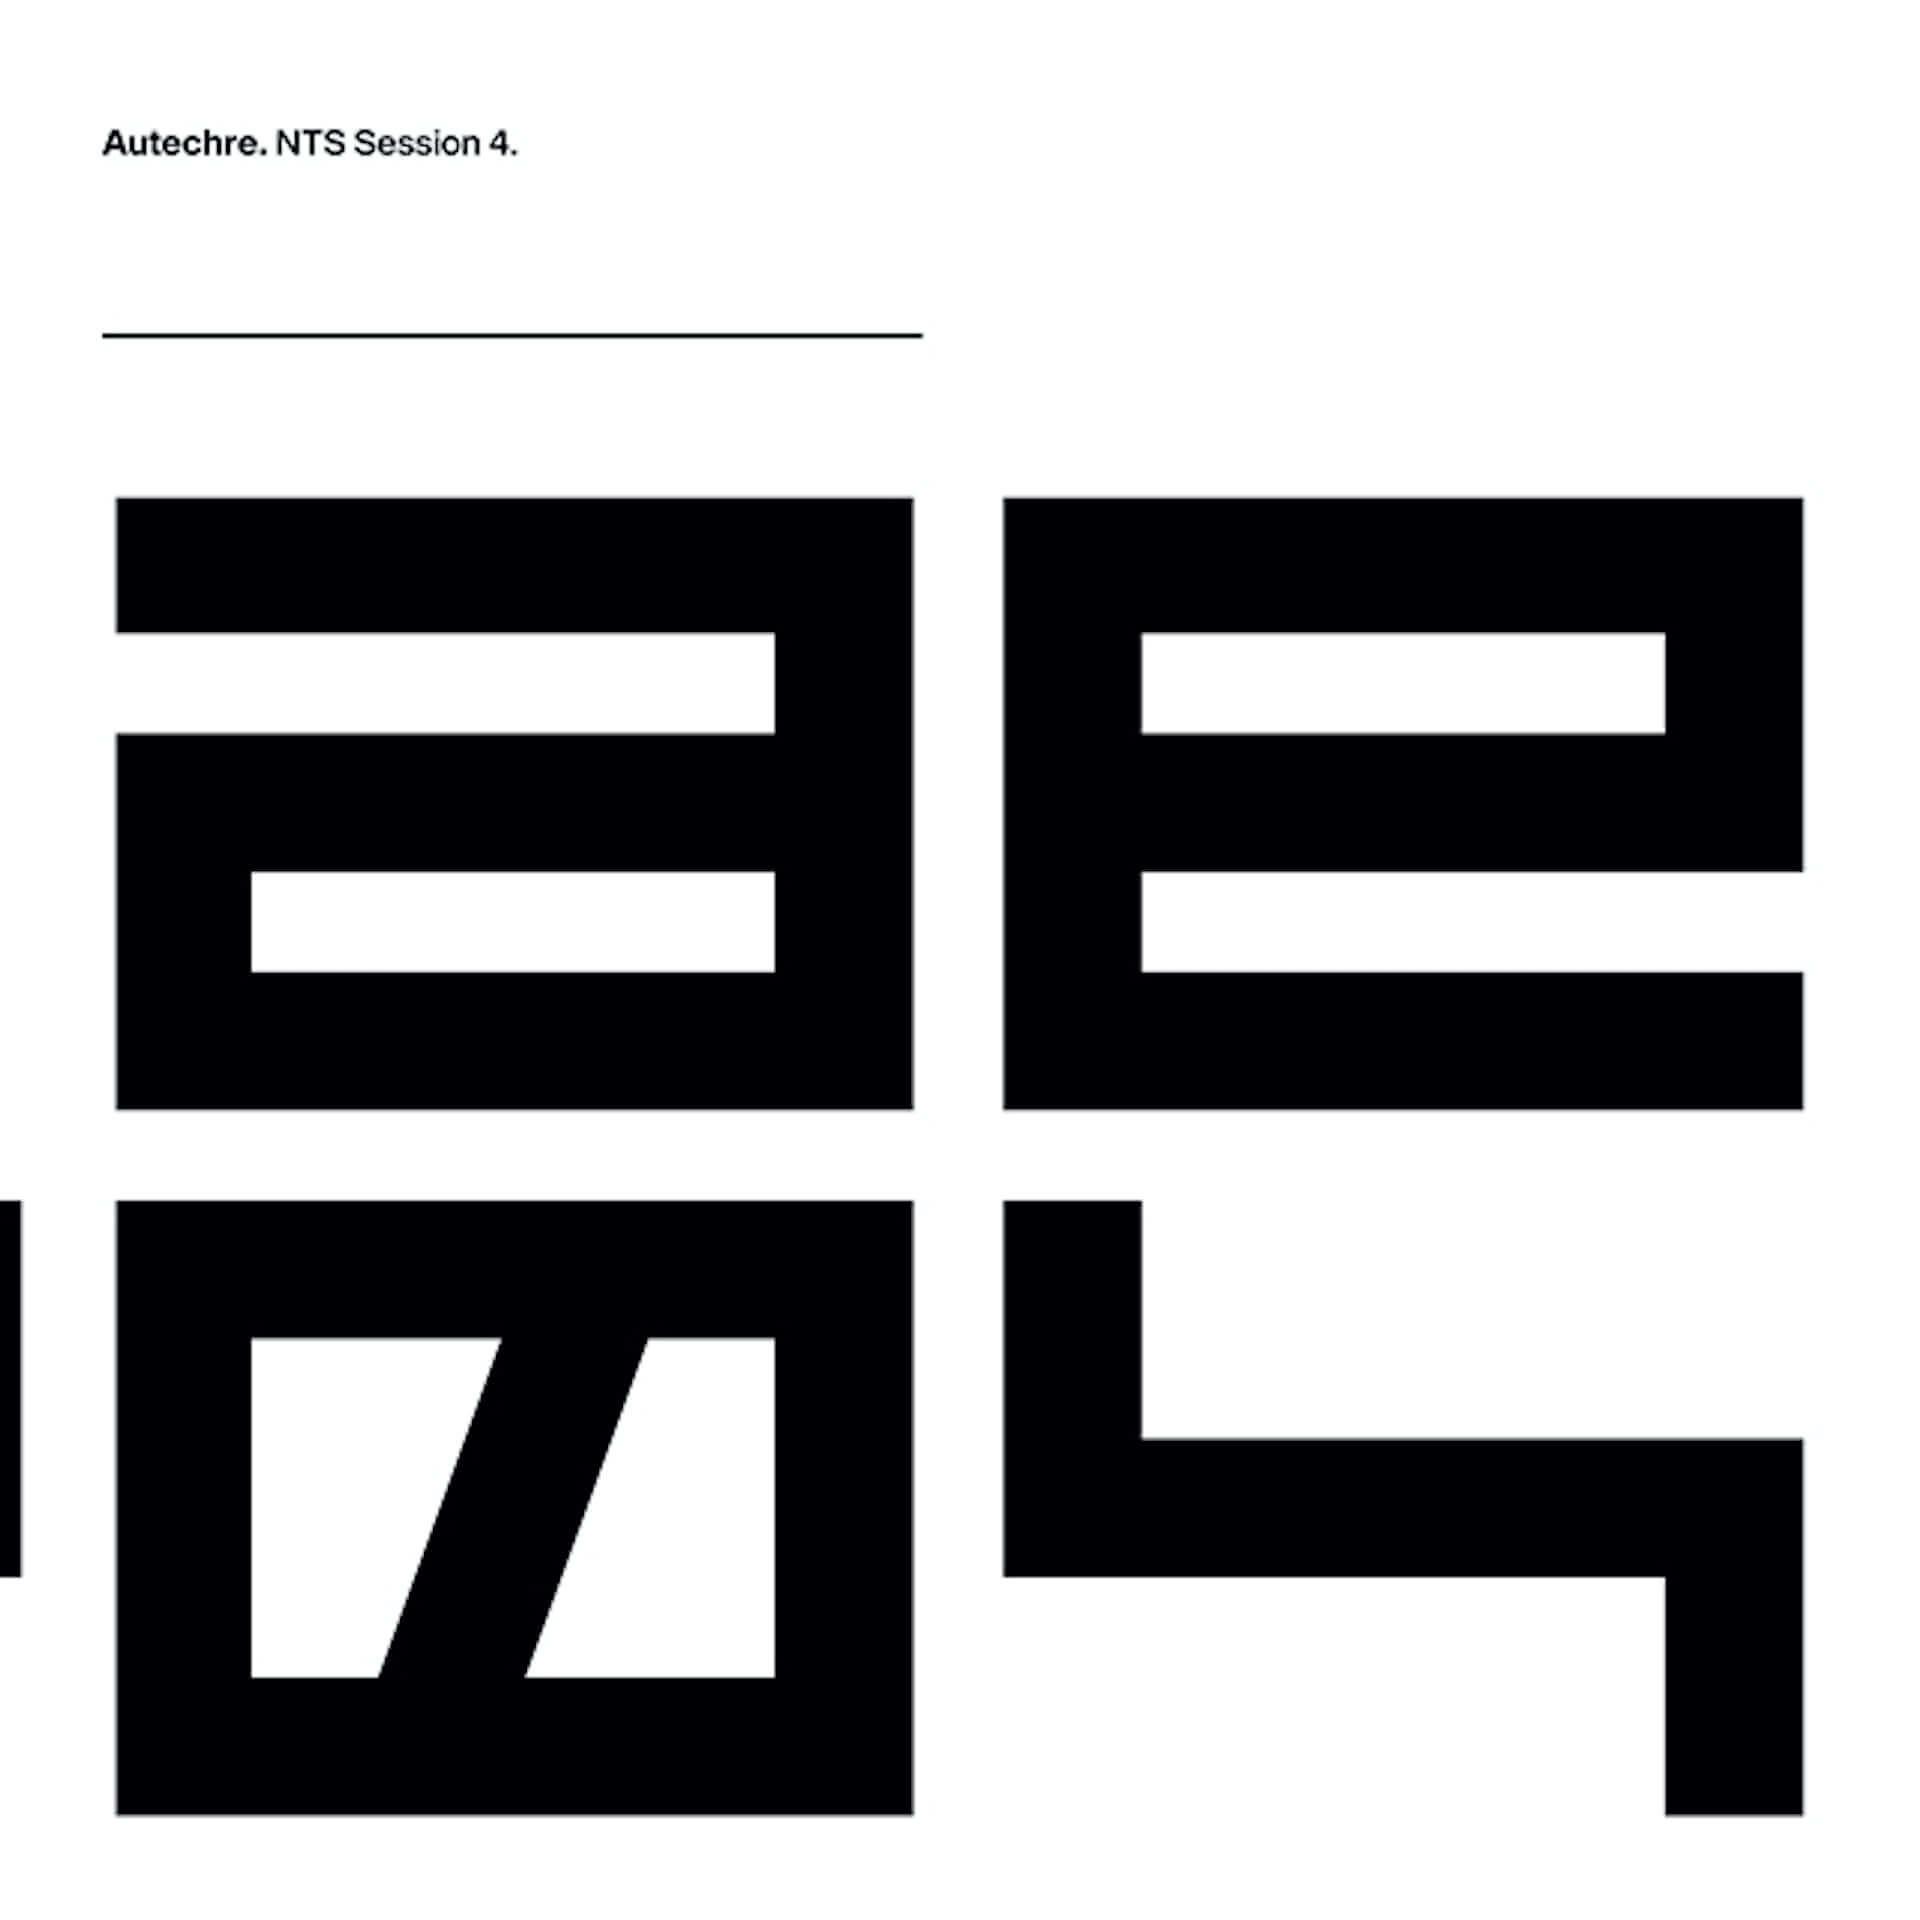 Autechreが2016年〜2018年のライブ音源7作をリリース!至極のIDM/エレクトロニカ作品 music200410_autechre_5-1920x1920